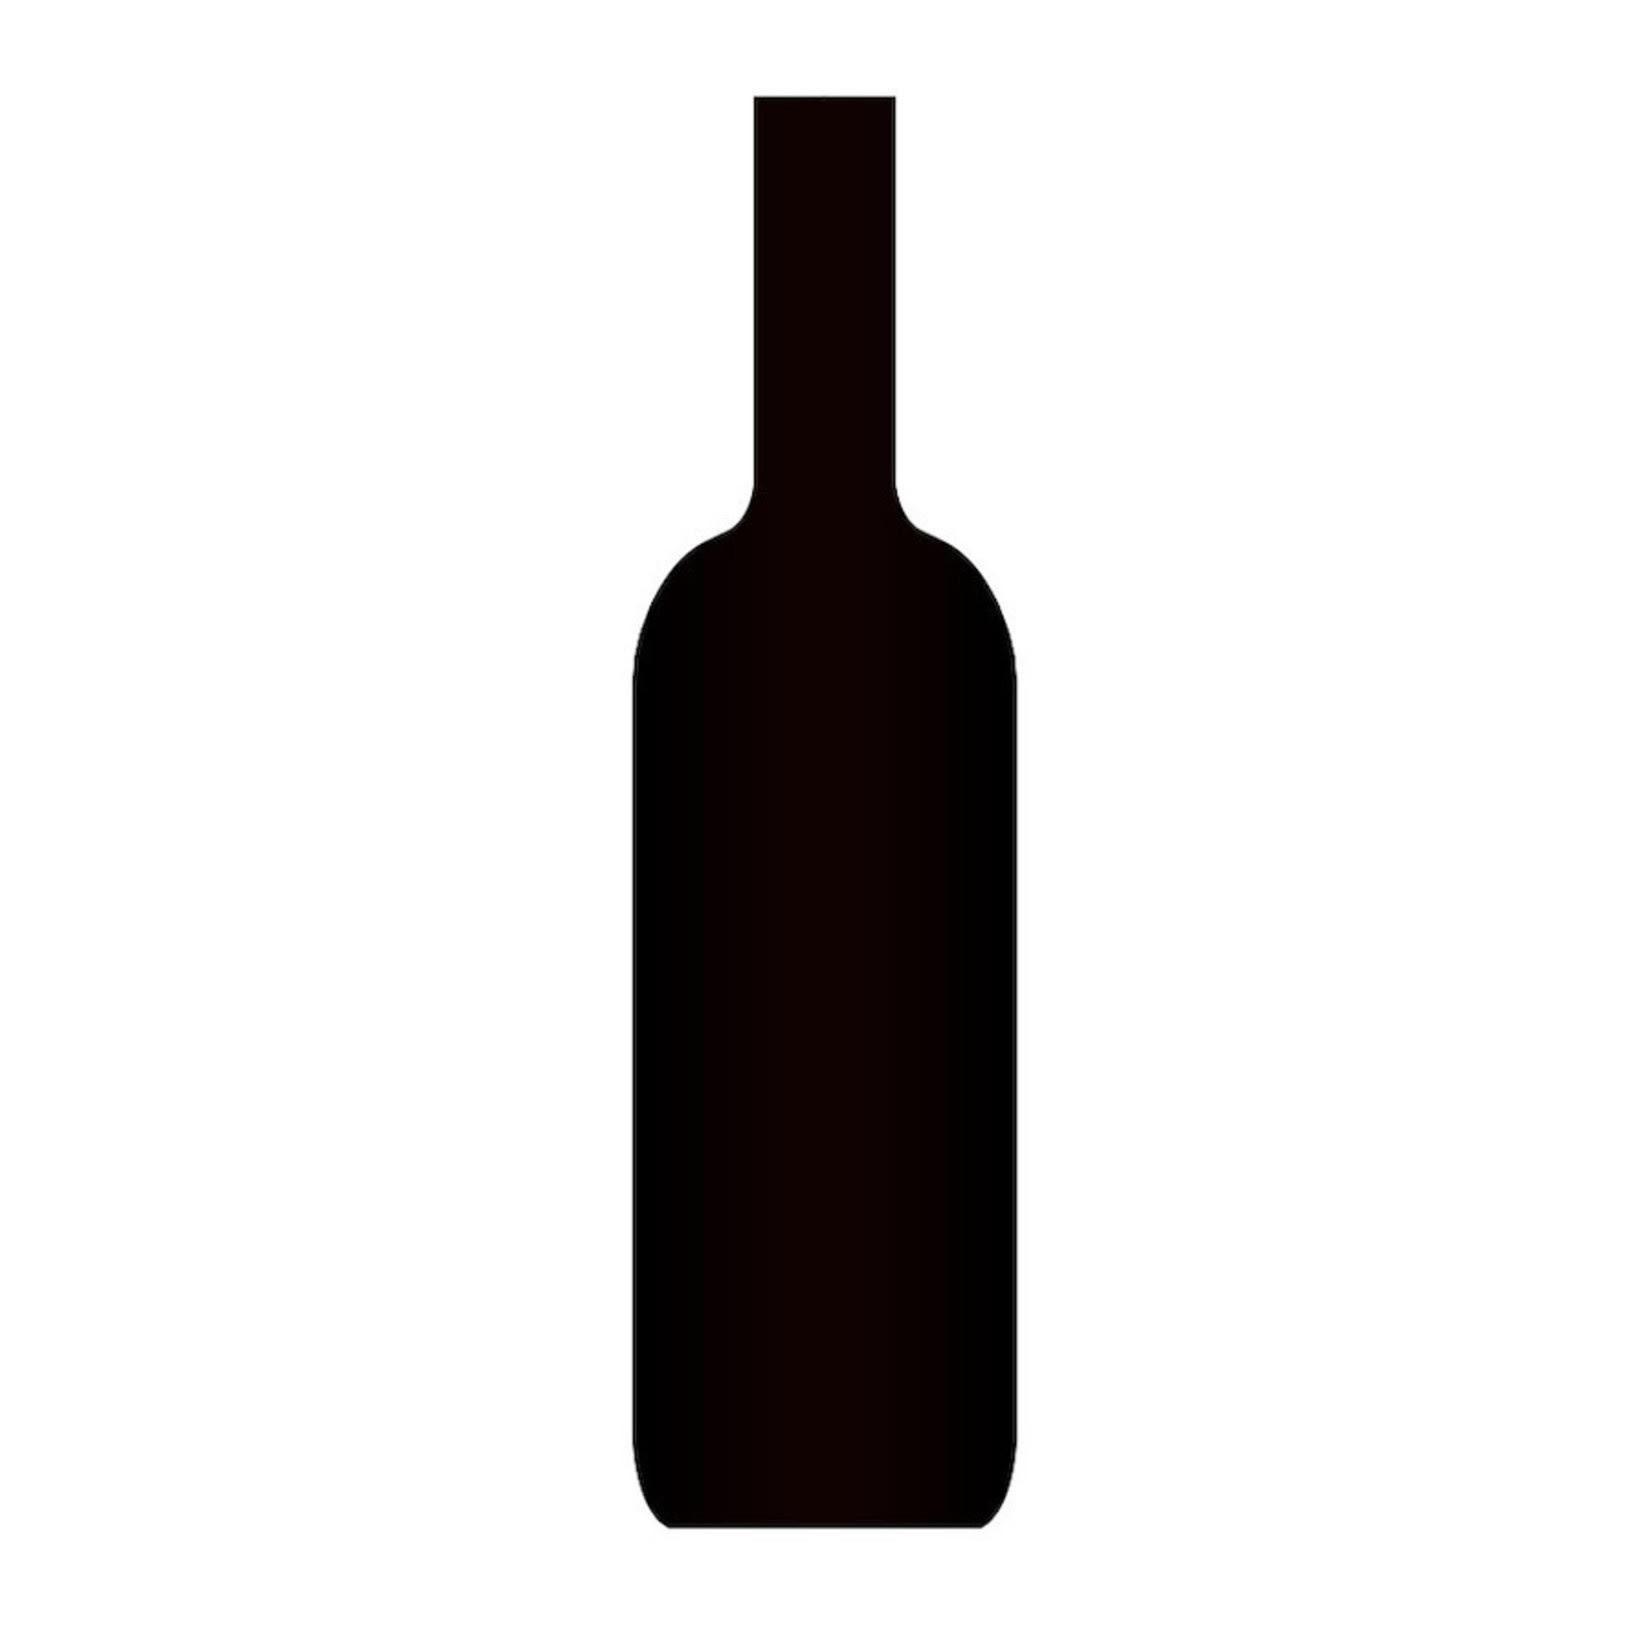 2019 Courtault Tardieux Sauvigon Blanc